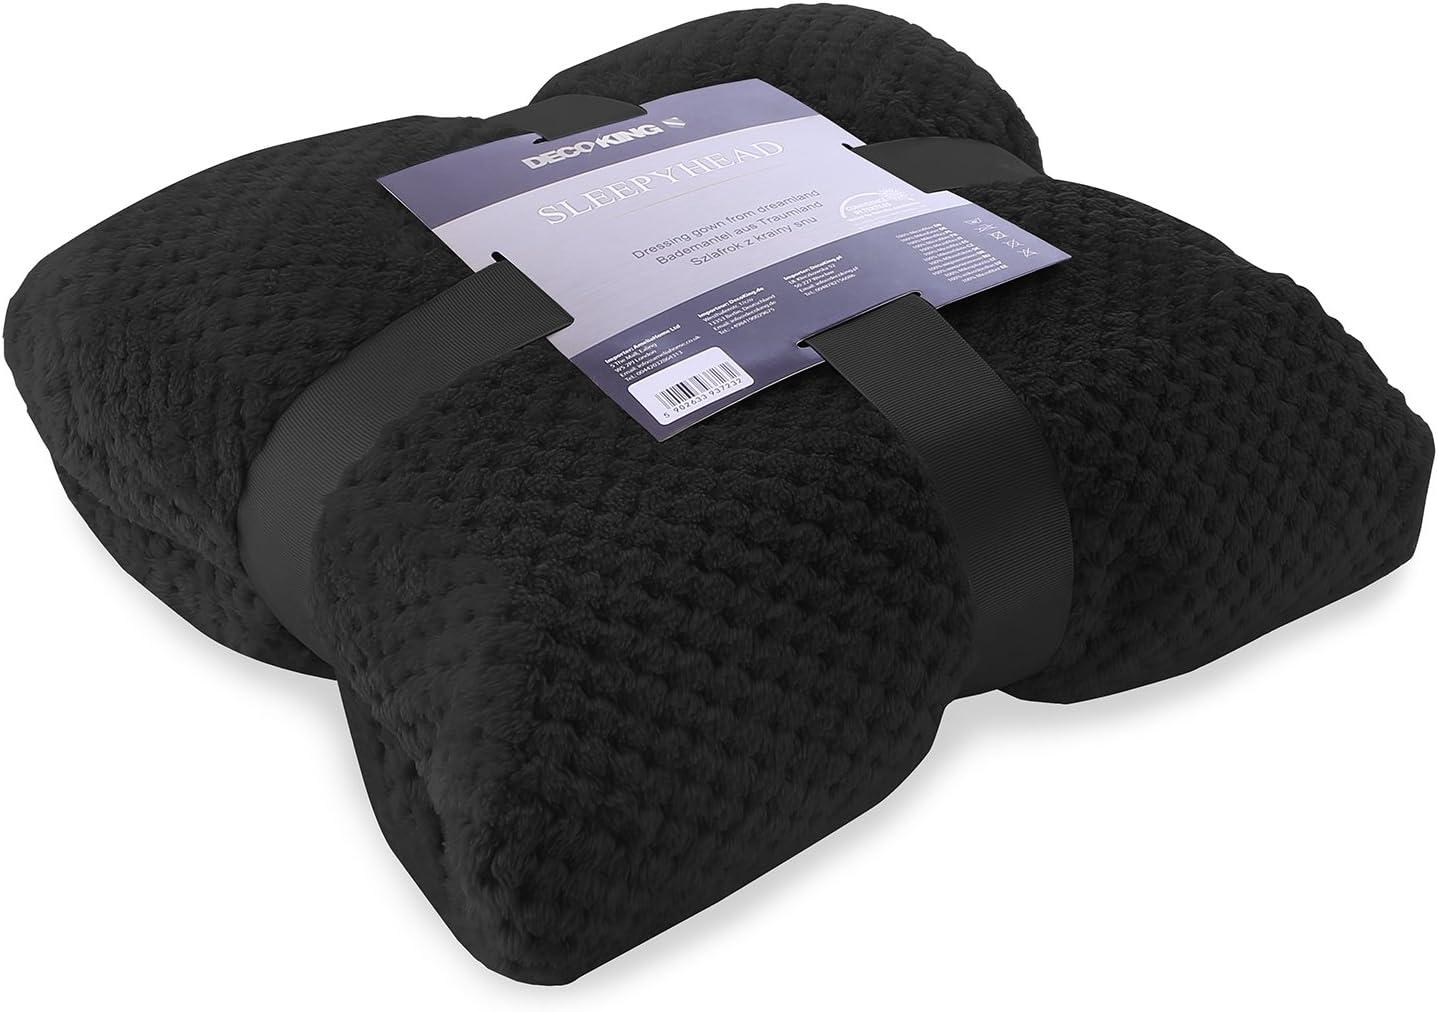 DecoKing Vestaglia XXXL Corto Donna Uomo Unisex Cappuccio Microfibra Soffice Morbido Piacevole Pile Beige Sleepyhead